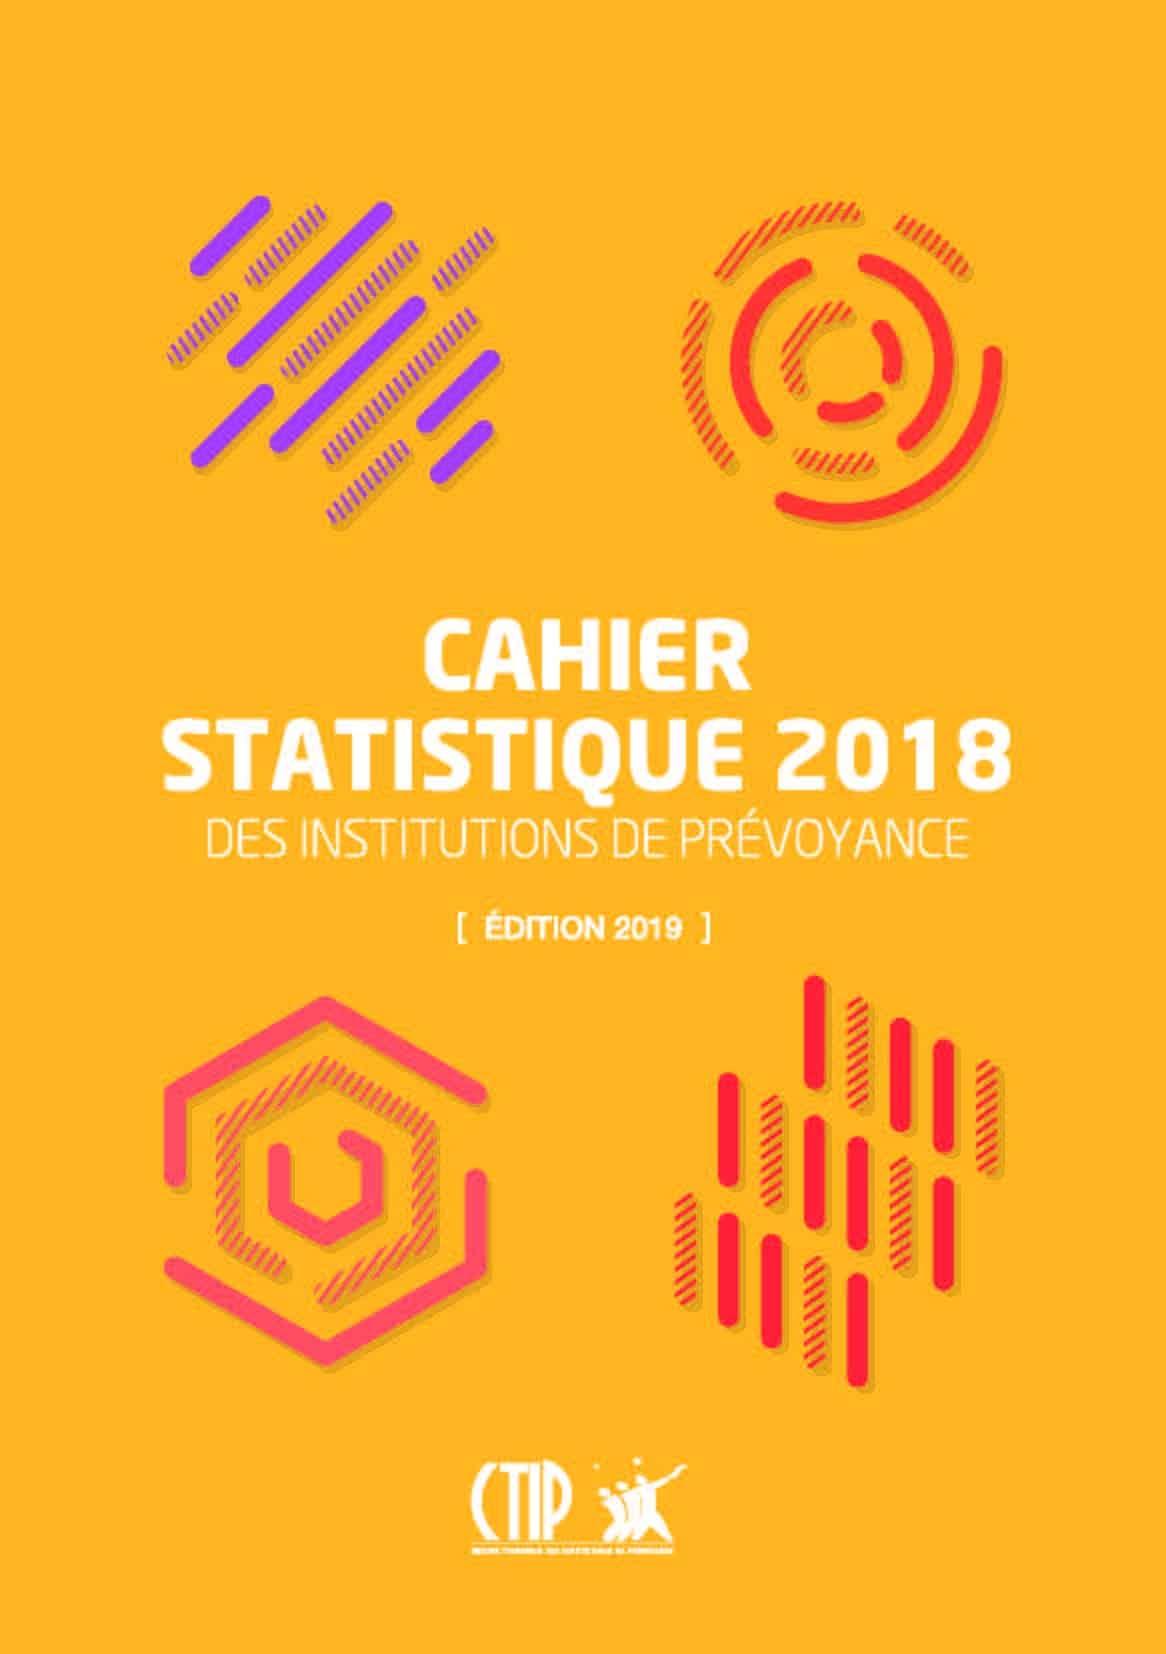 Cahier statistique 2018